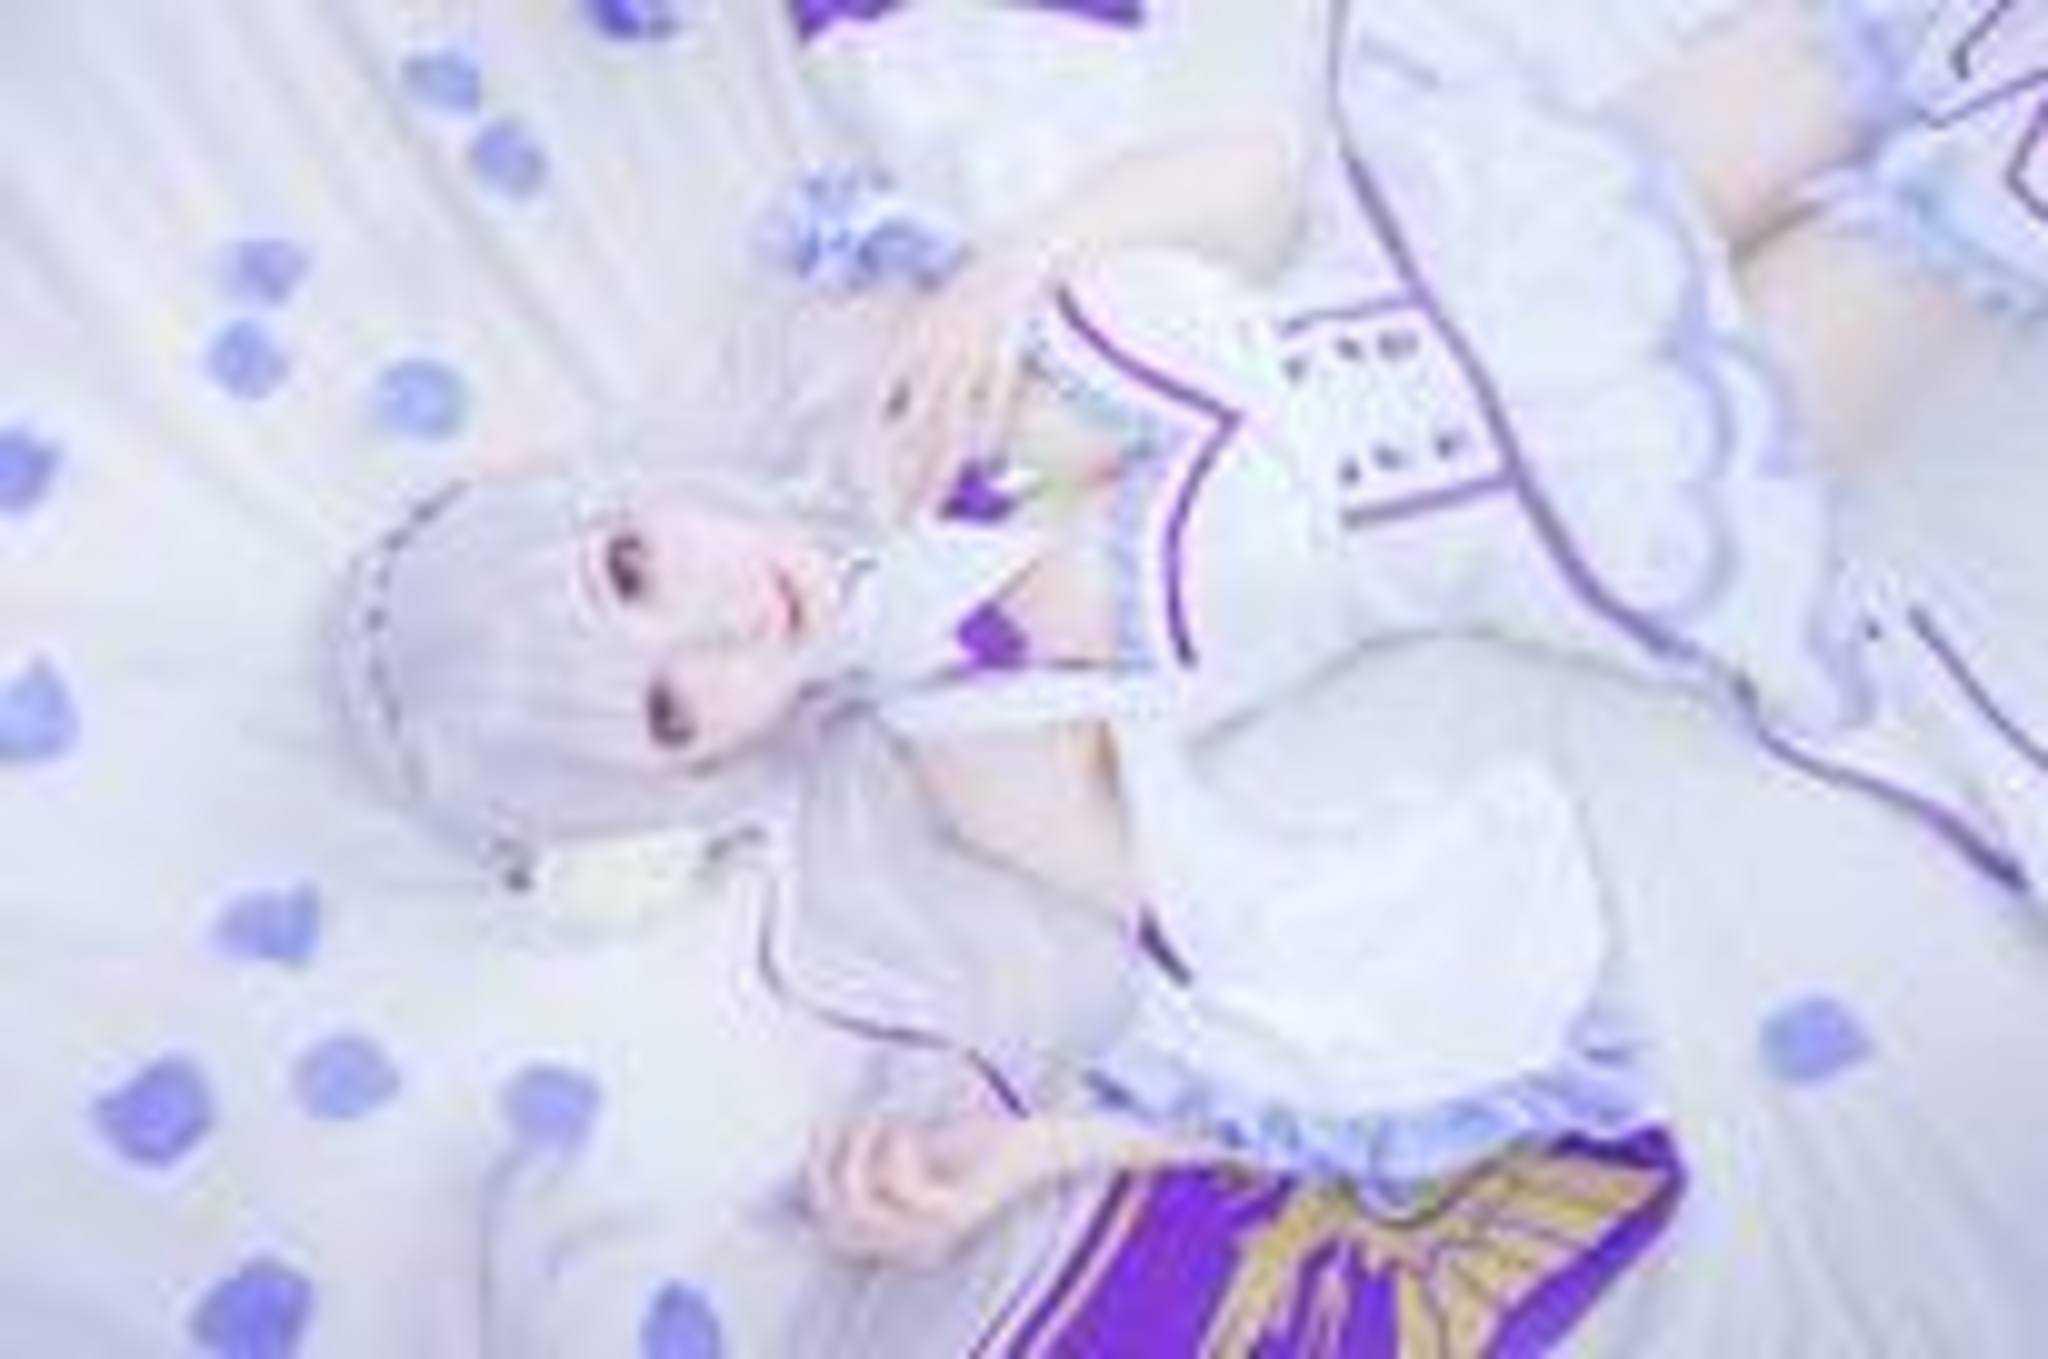 Monさん/『Re:ゼロから始める異世界生活』エミリア